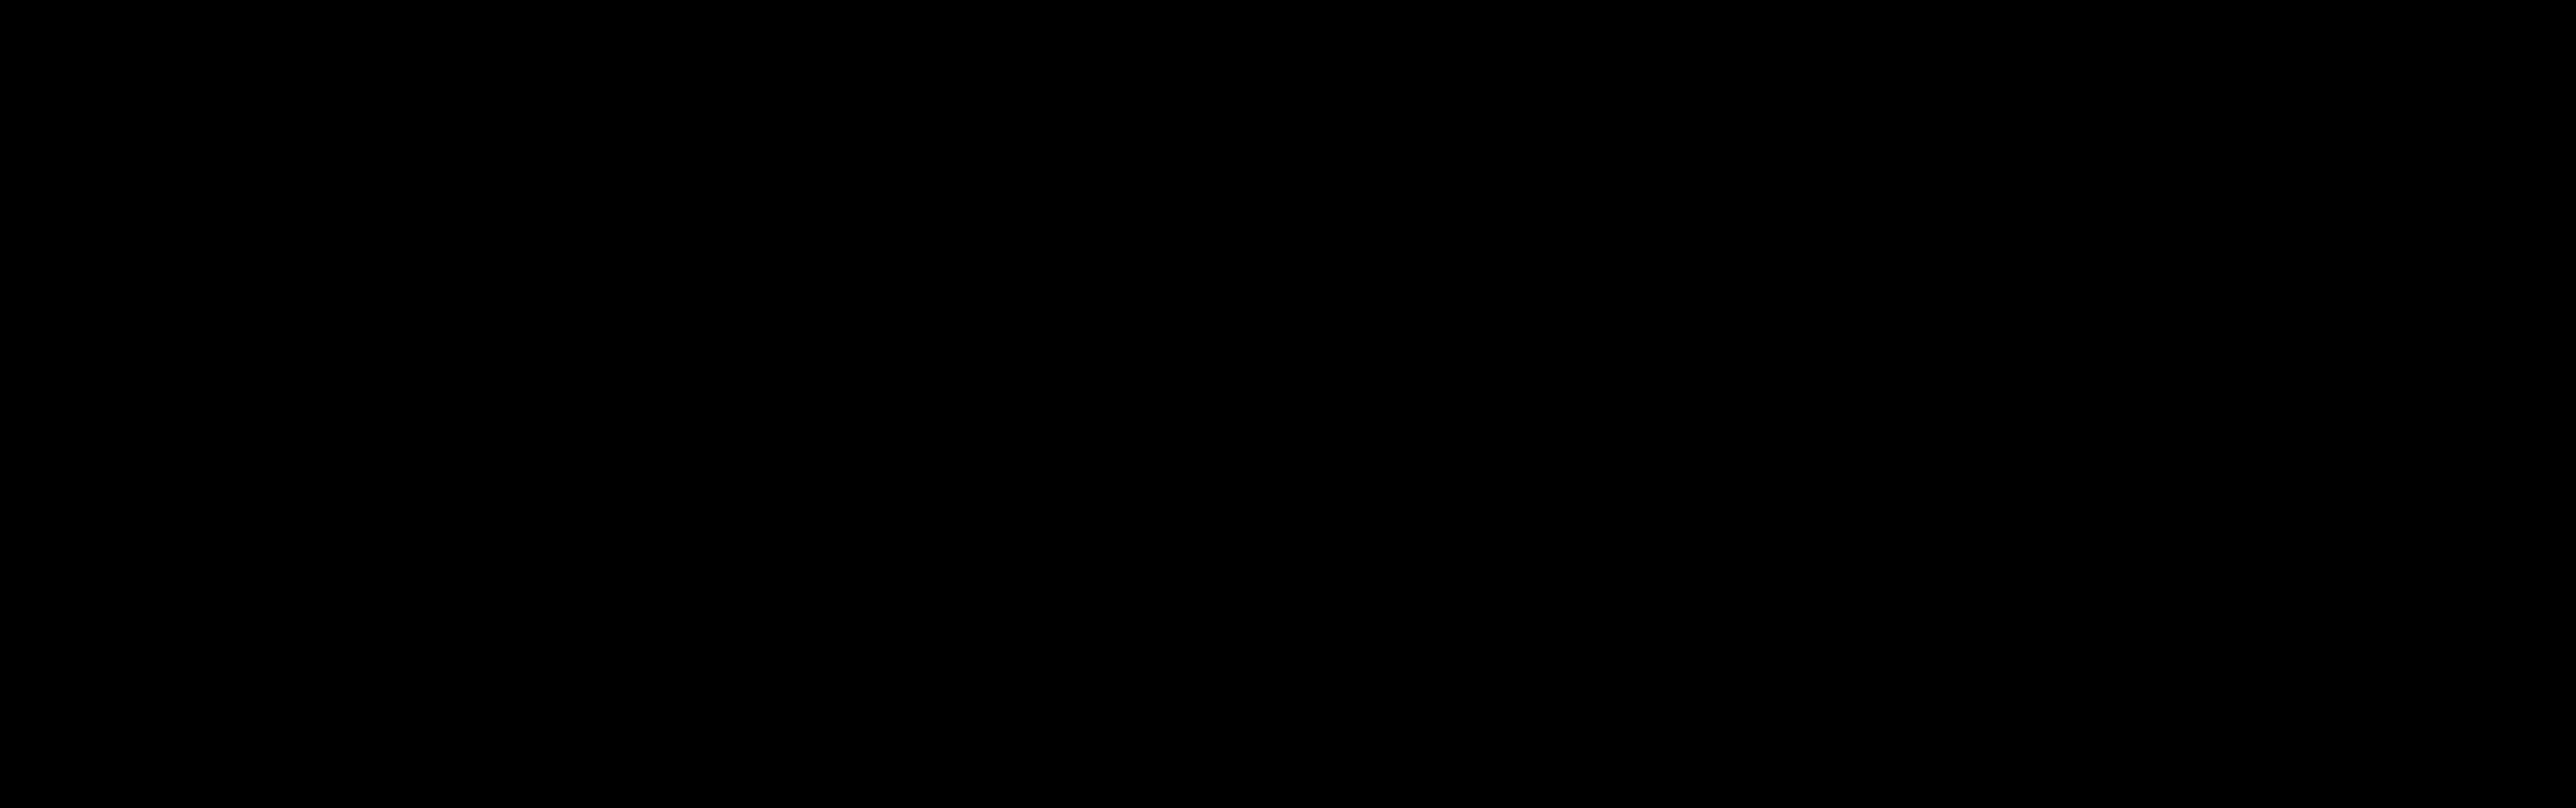 Marca - VOYAGER